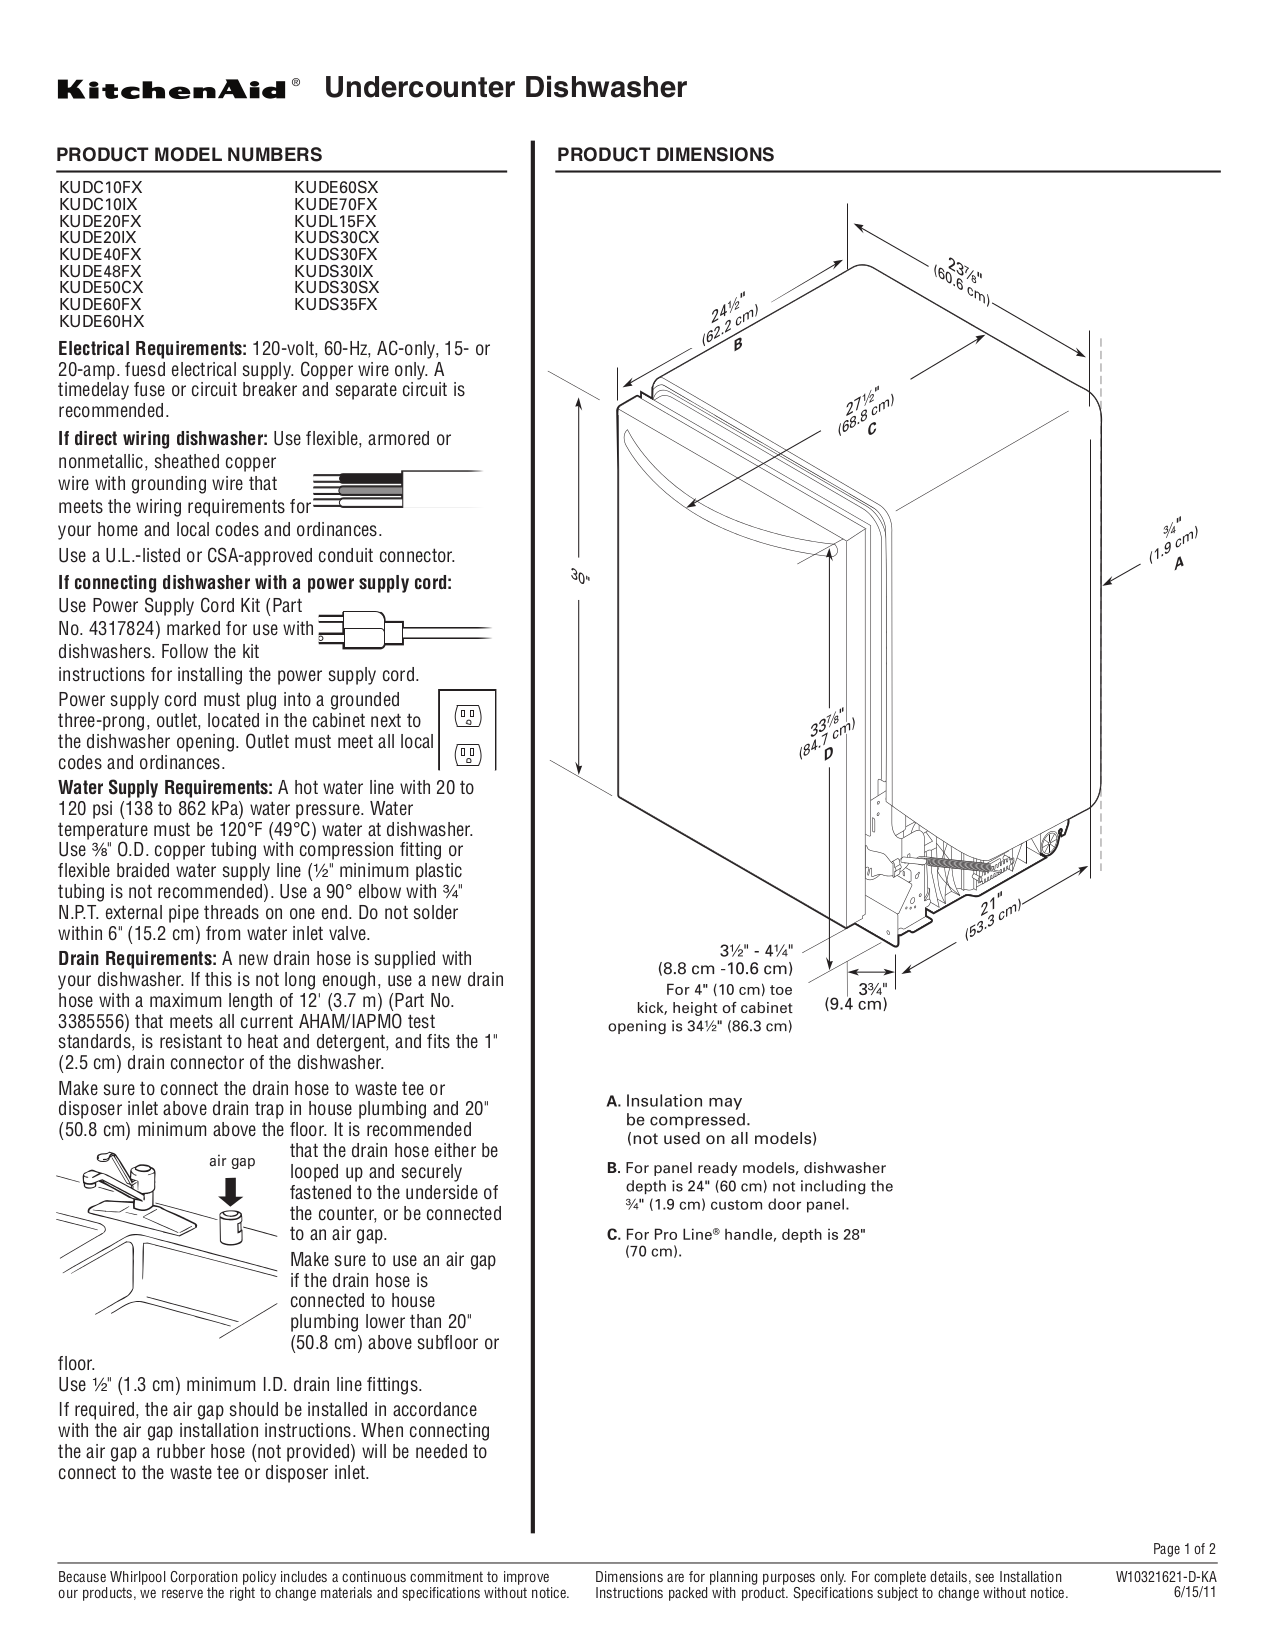 Download free pdf for KitchenAid KUDS35FXSS Dishwasher manual – Kitchenaid Dishwasher Wiring Harness Diagram